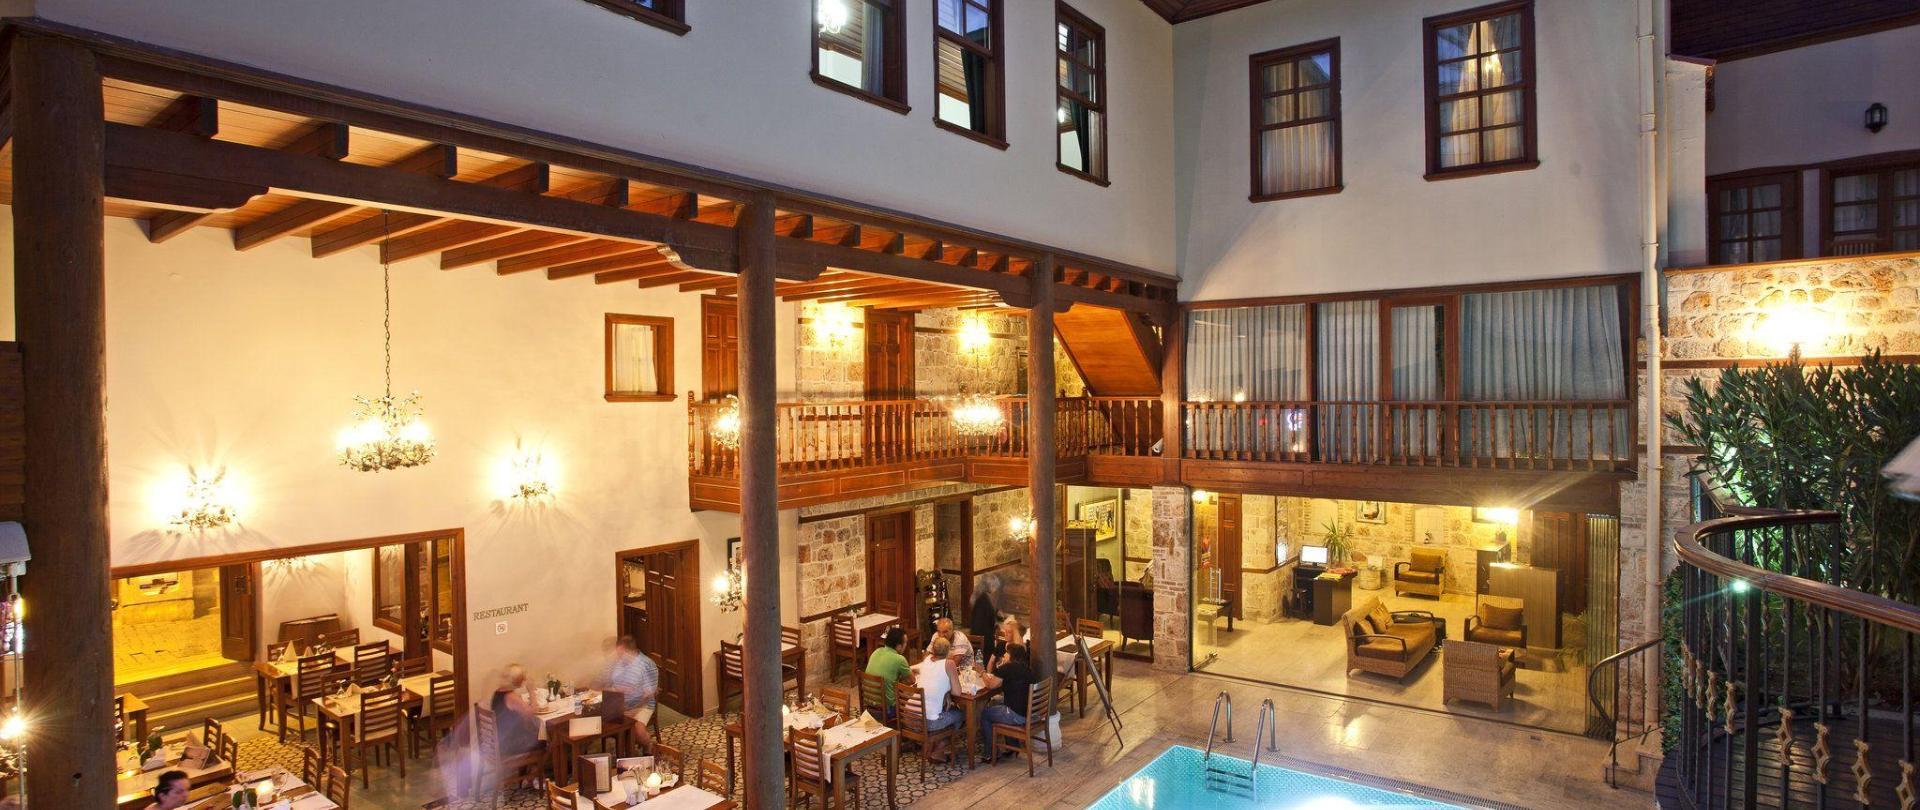 Mediterra Art Hotel Antalya Turkey